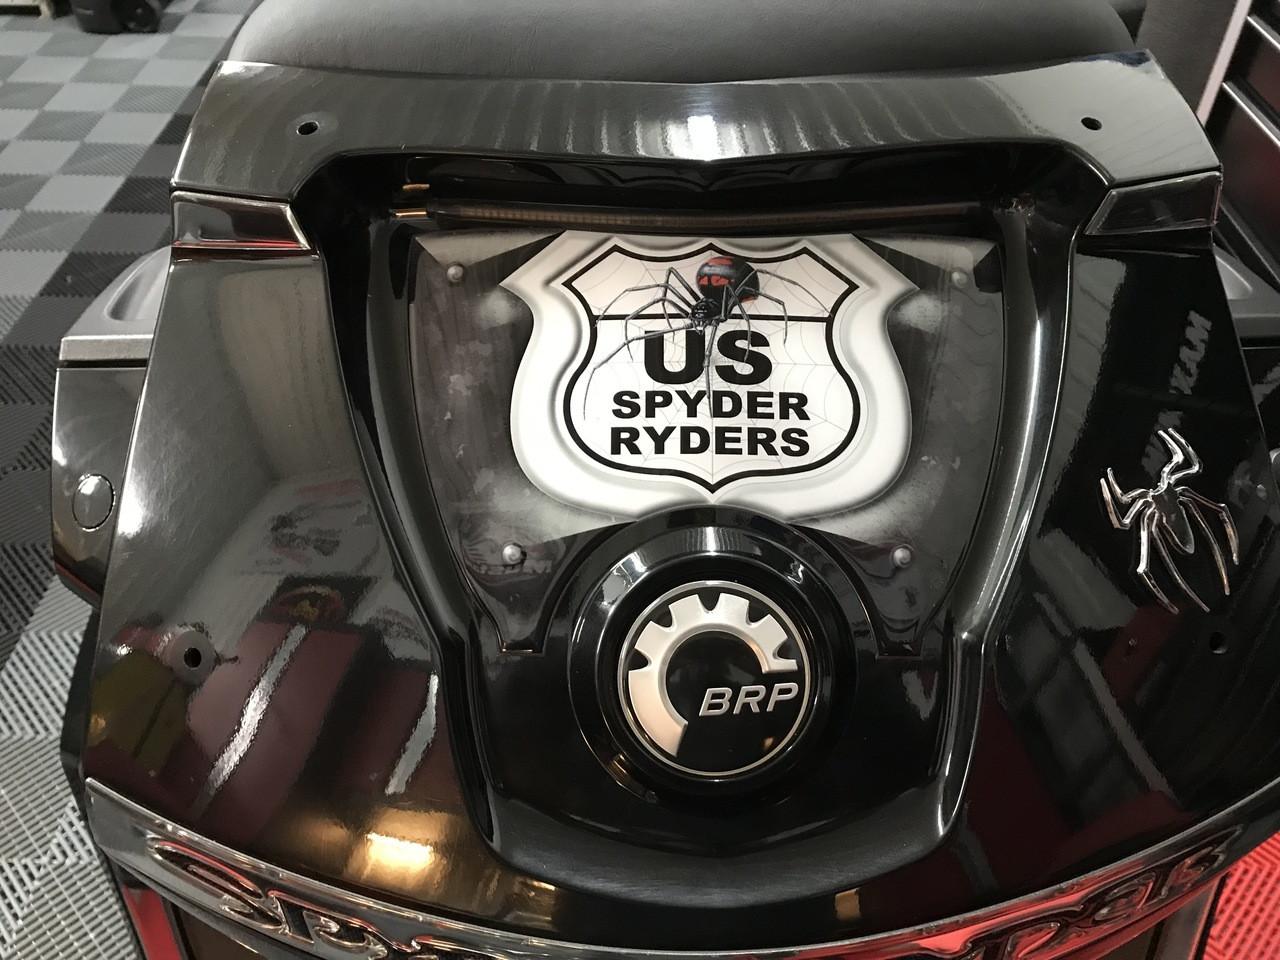 US Spyder Ryder Rear Trunk Urethane Domed Decal - GREY